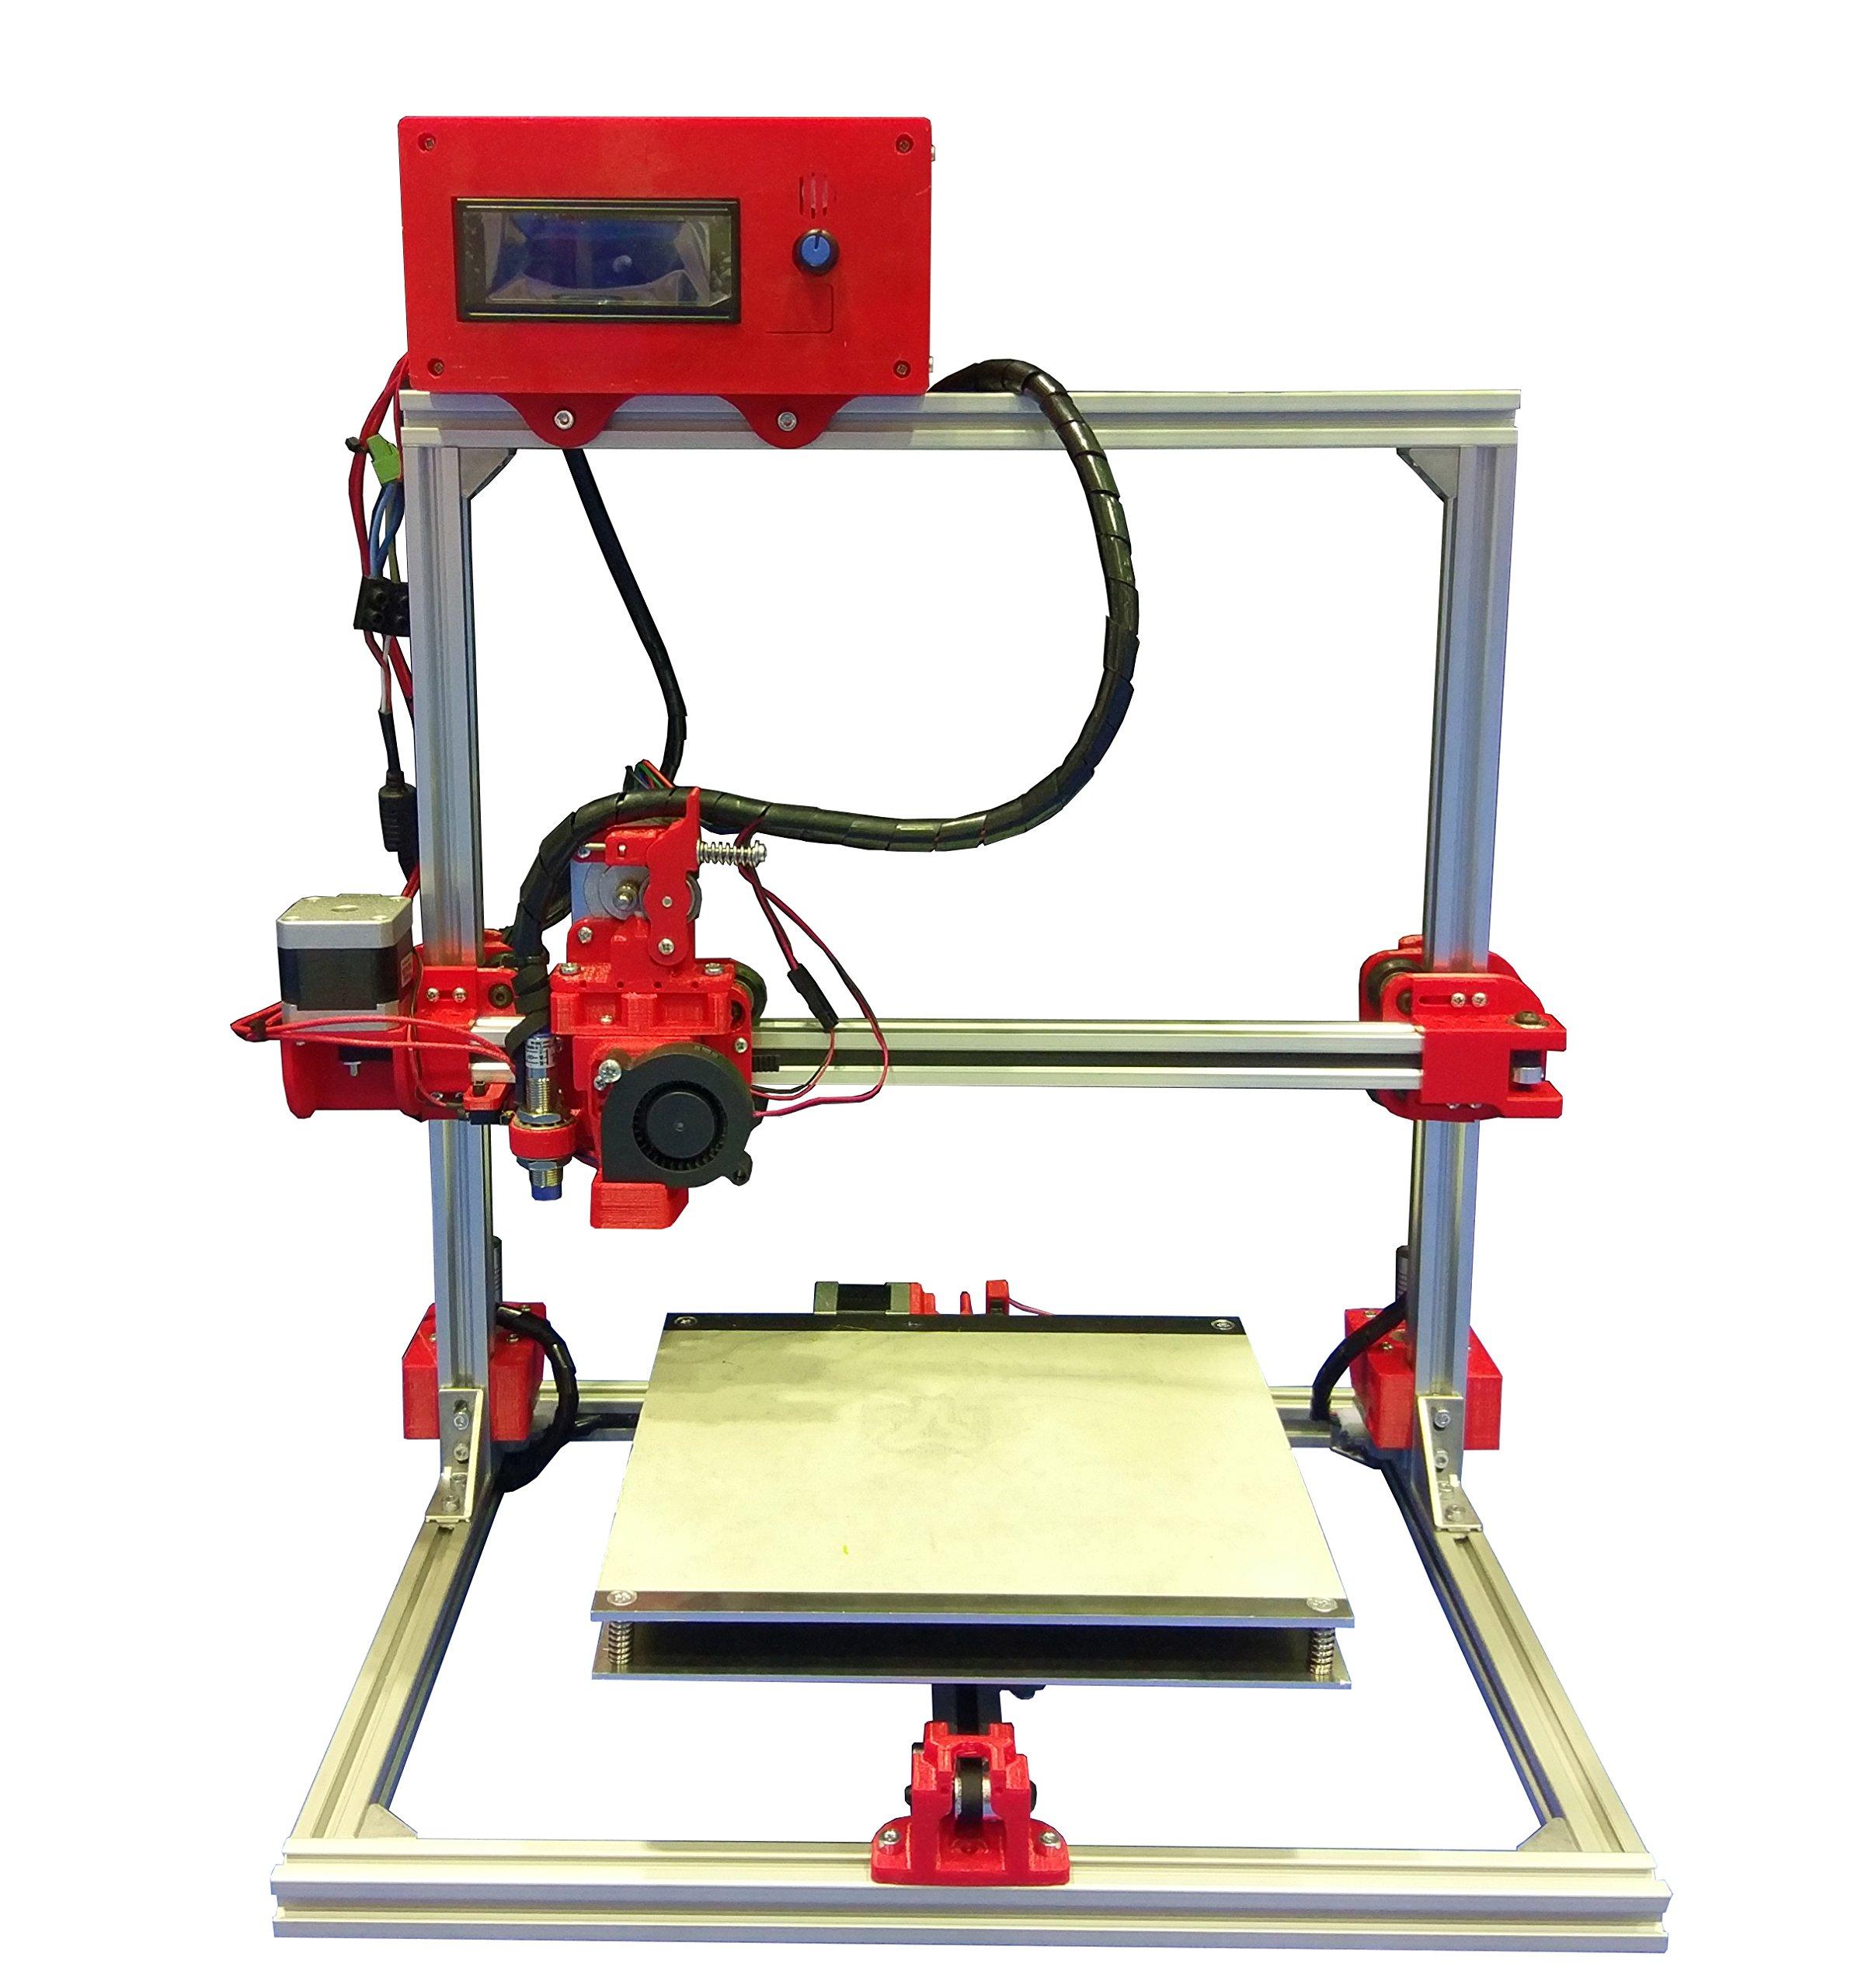 Scalar S – 20 x 20 x 20 cm – Impresora 3D Francesa: Amazon.es ...